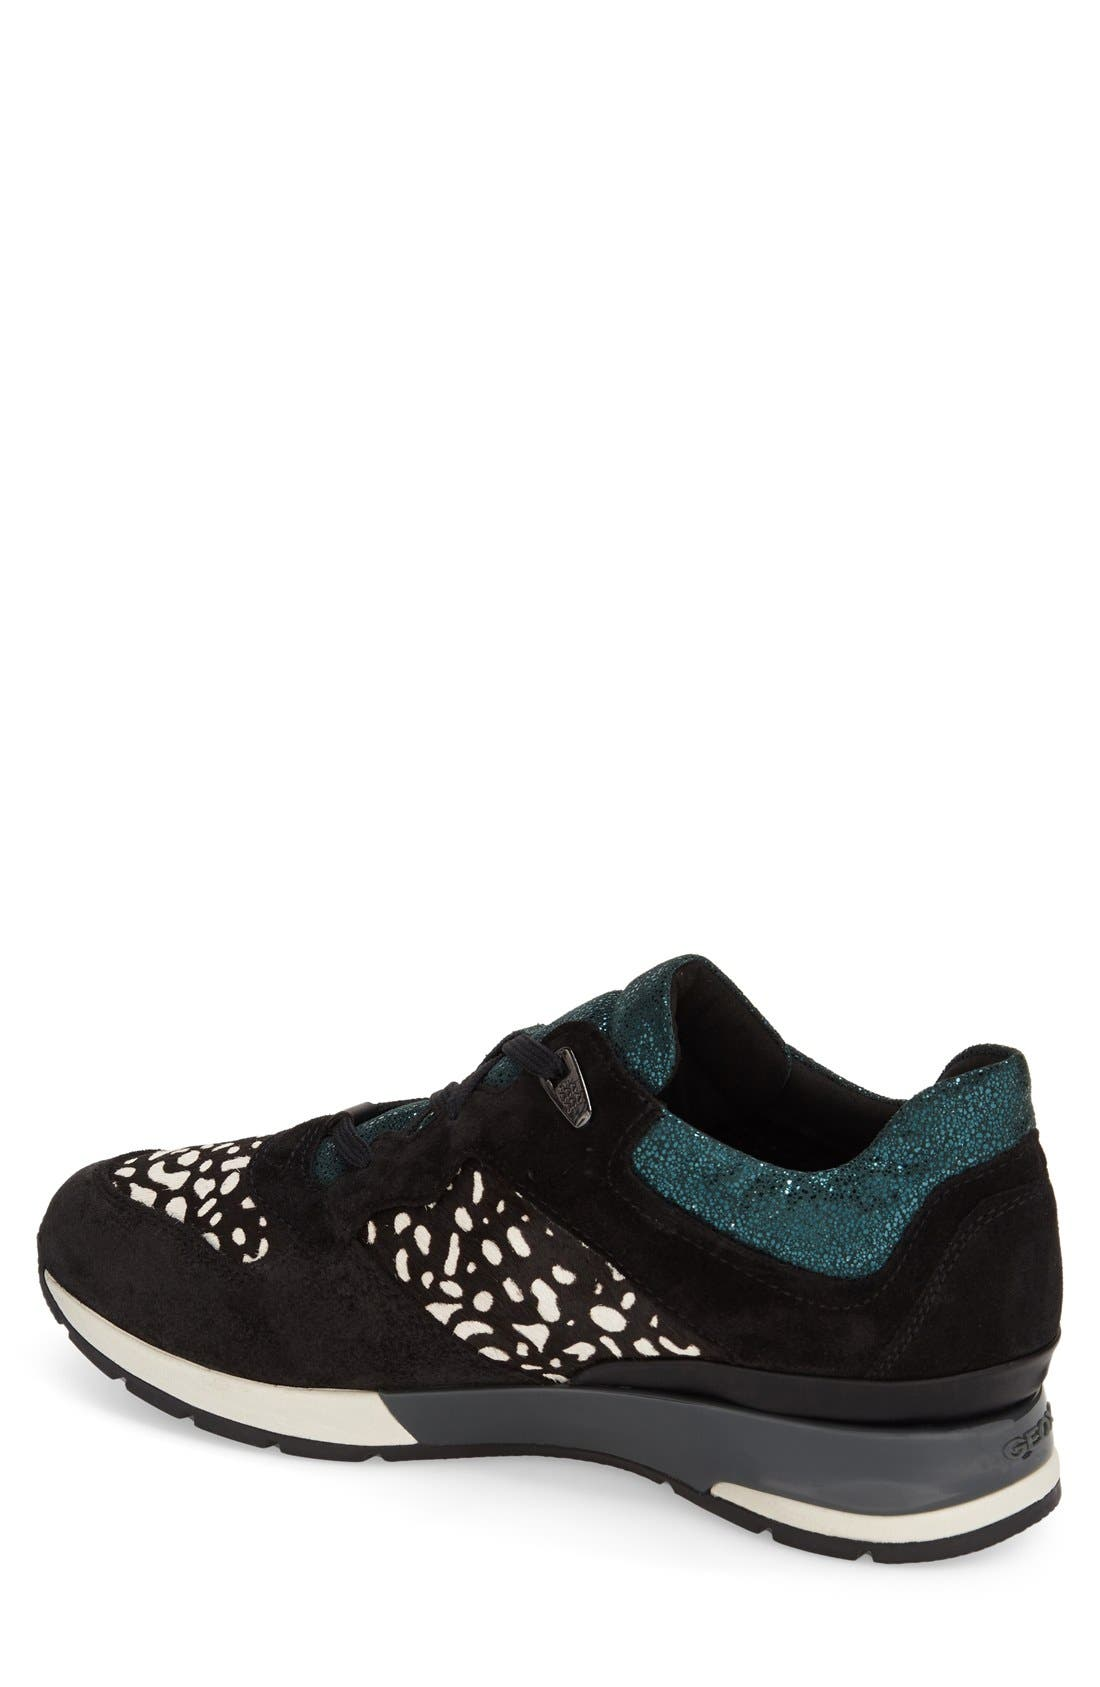 'Shahira' Sneaker,                             Alternate thumbnail 2, color,                             001